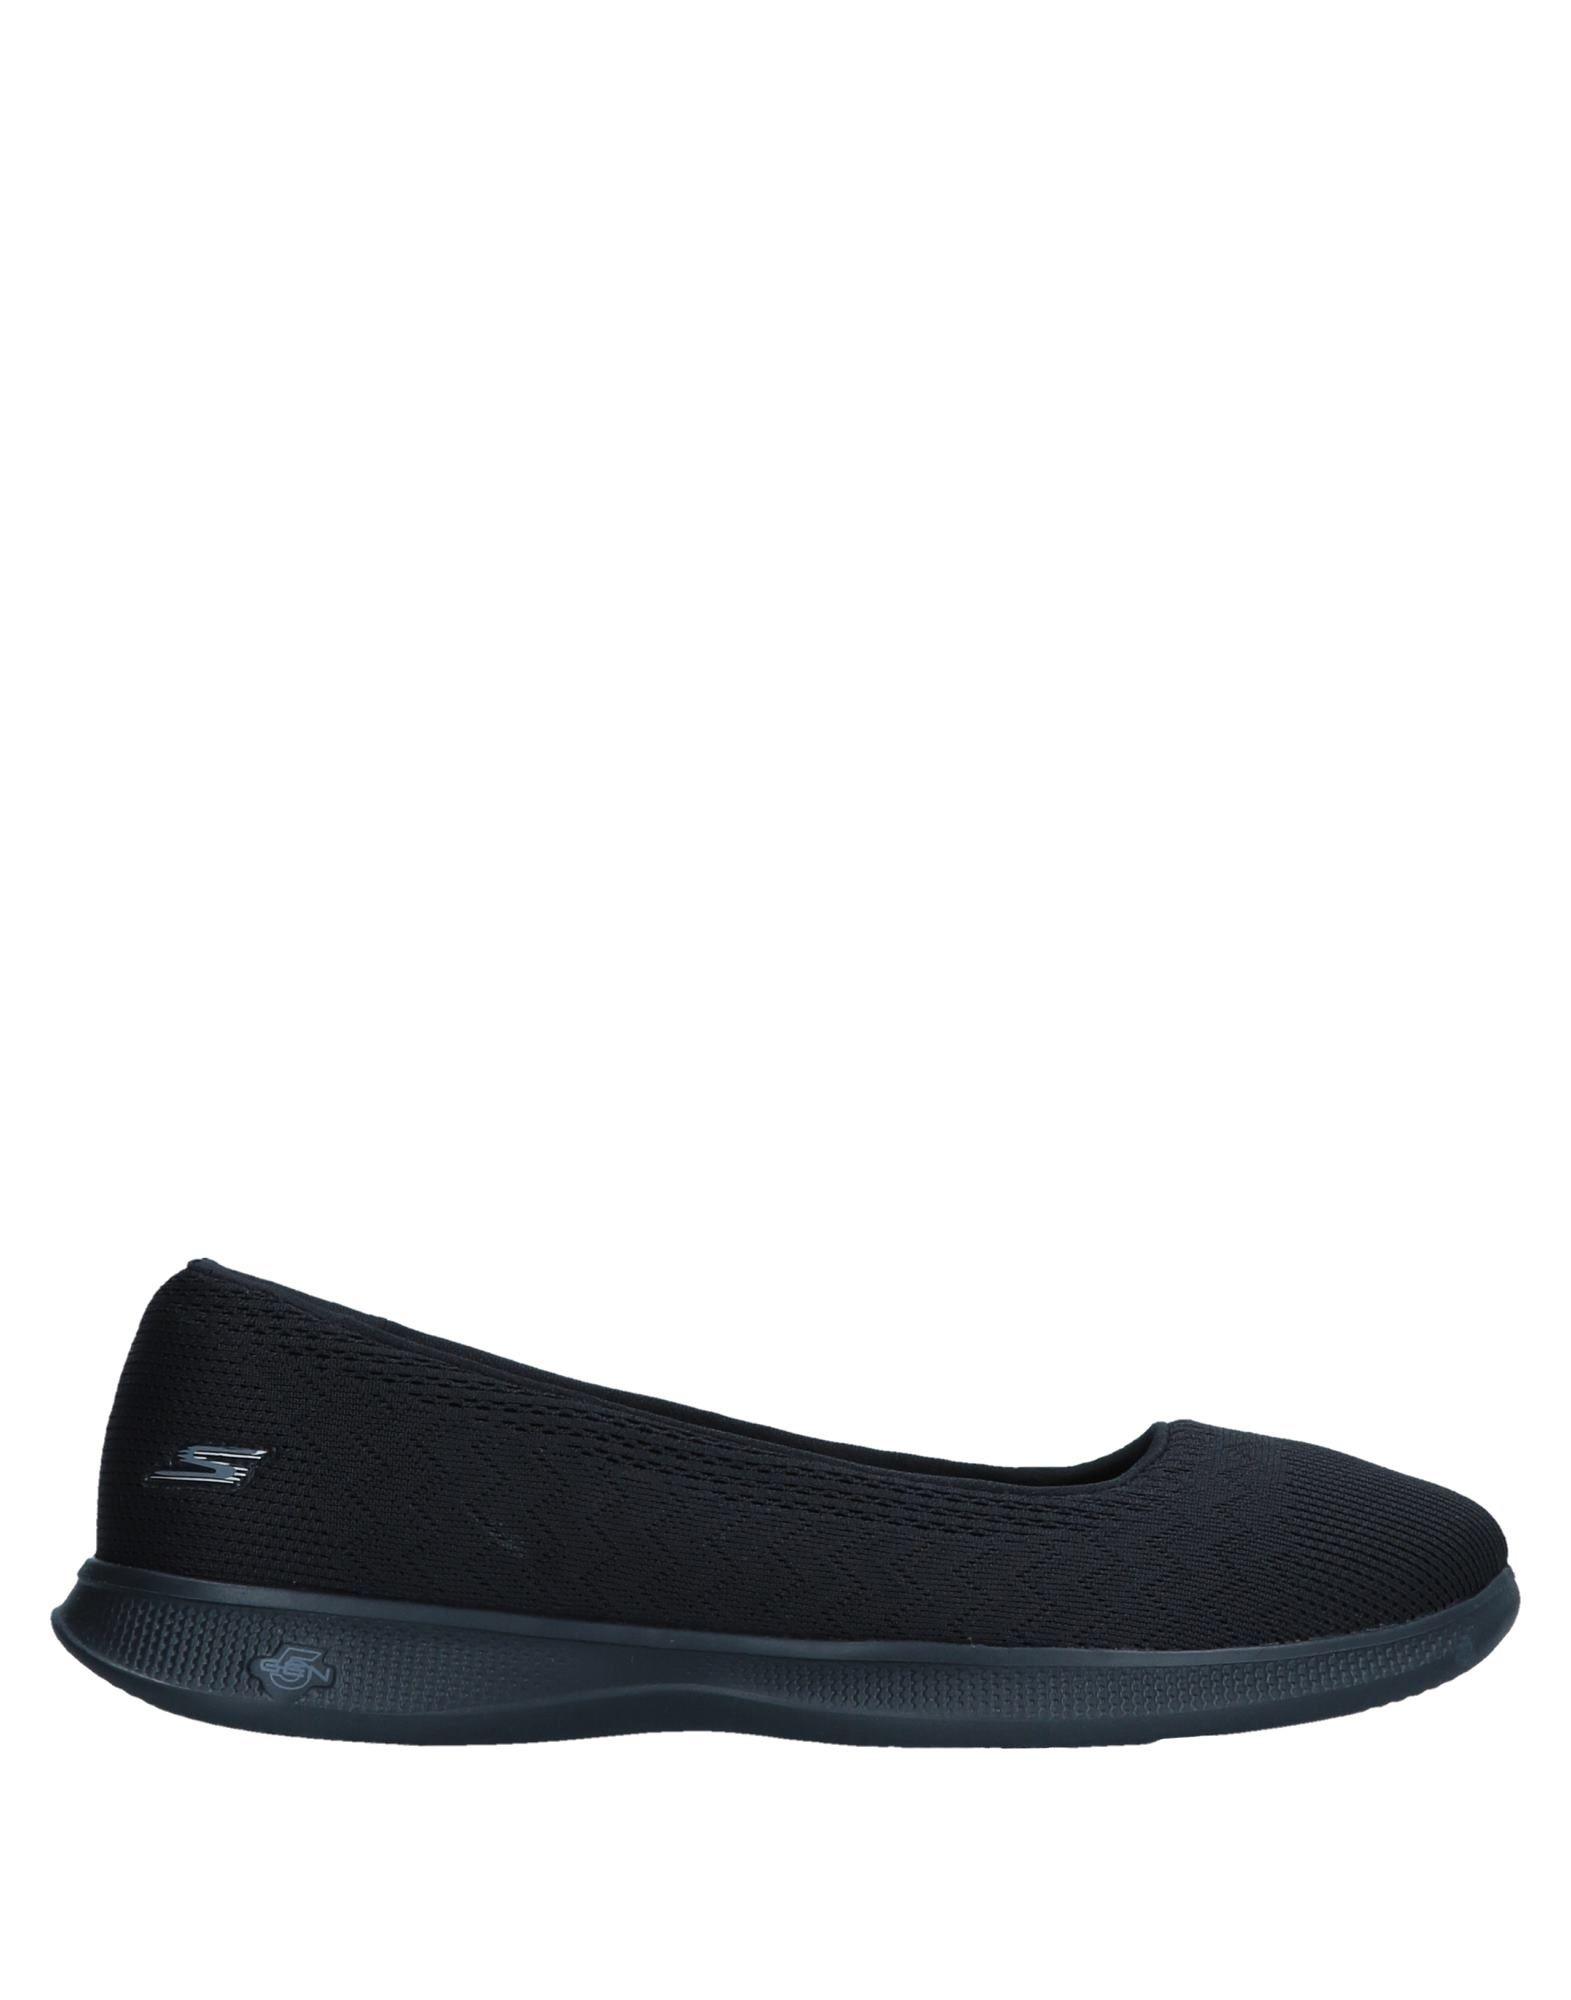 Skechers Ballerinas Damen  11557430NQ Gute Qualität beliebte Schuhe